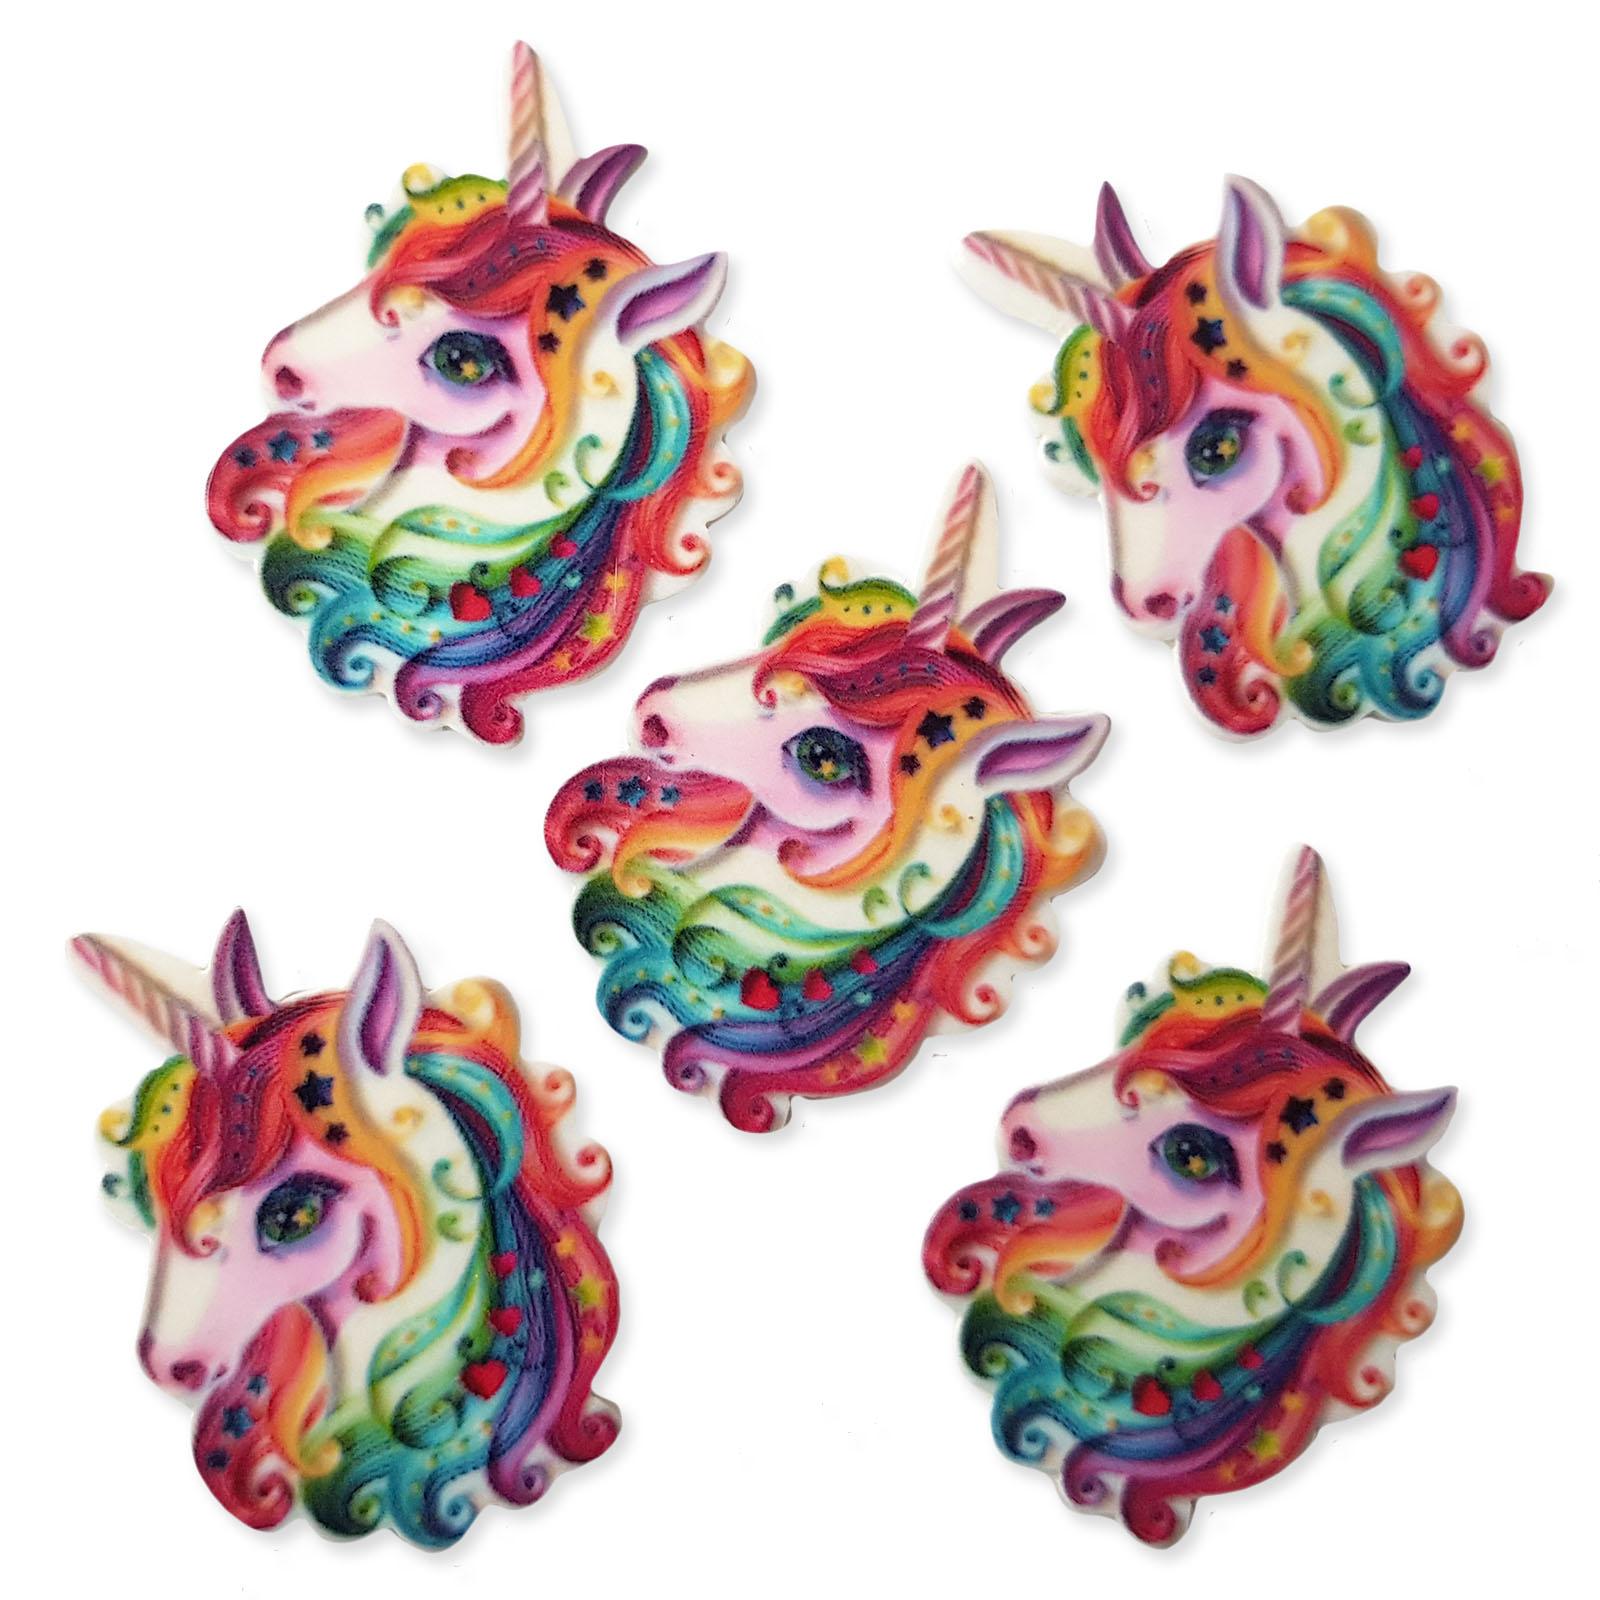 5pcs Tattoo Style Unicorn Flatback Acrylic Cabochons Embellishment Decoden Craft